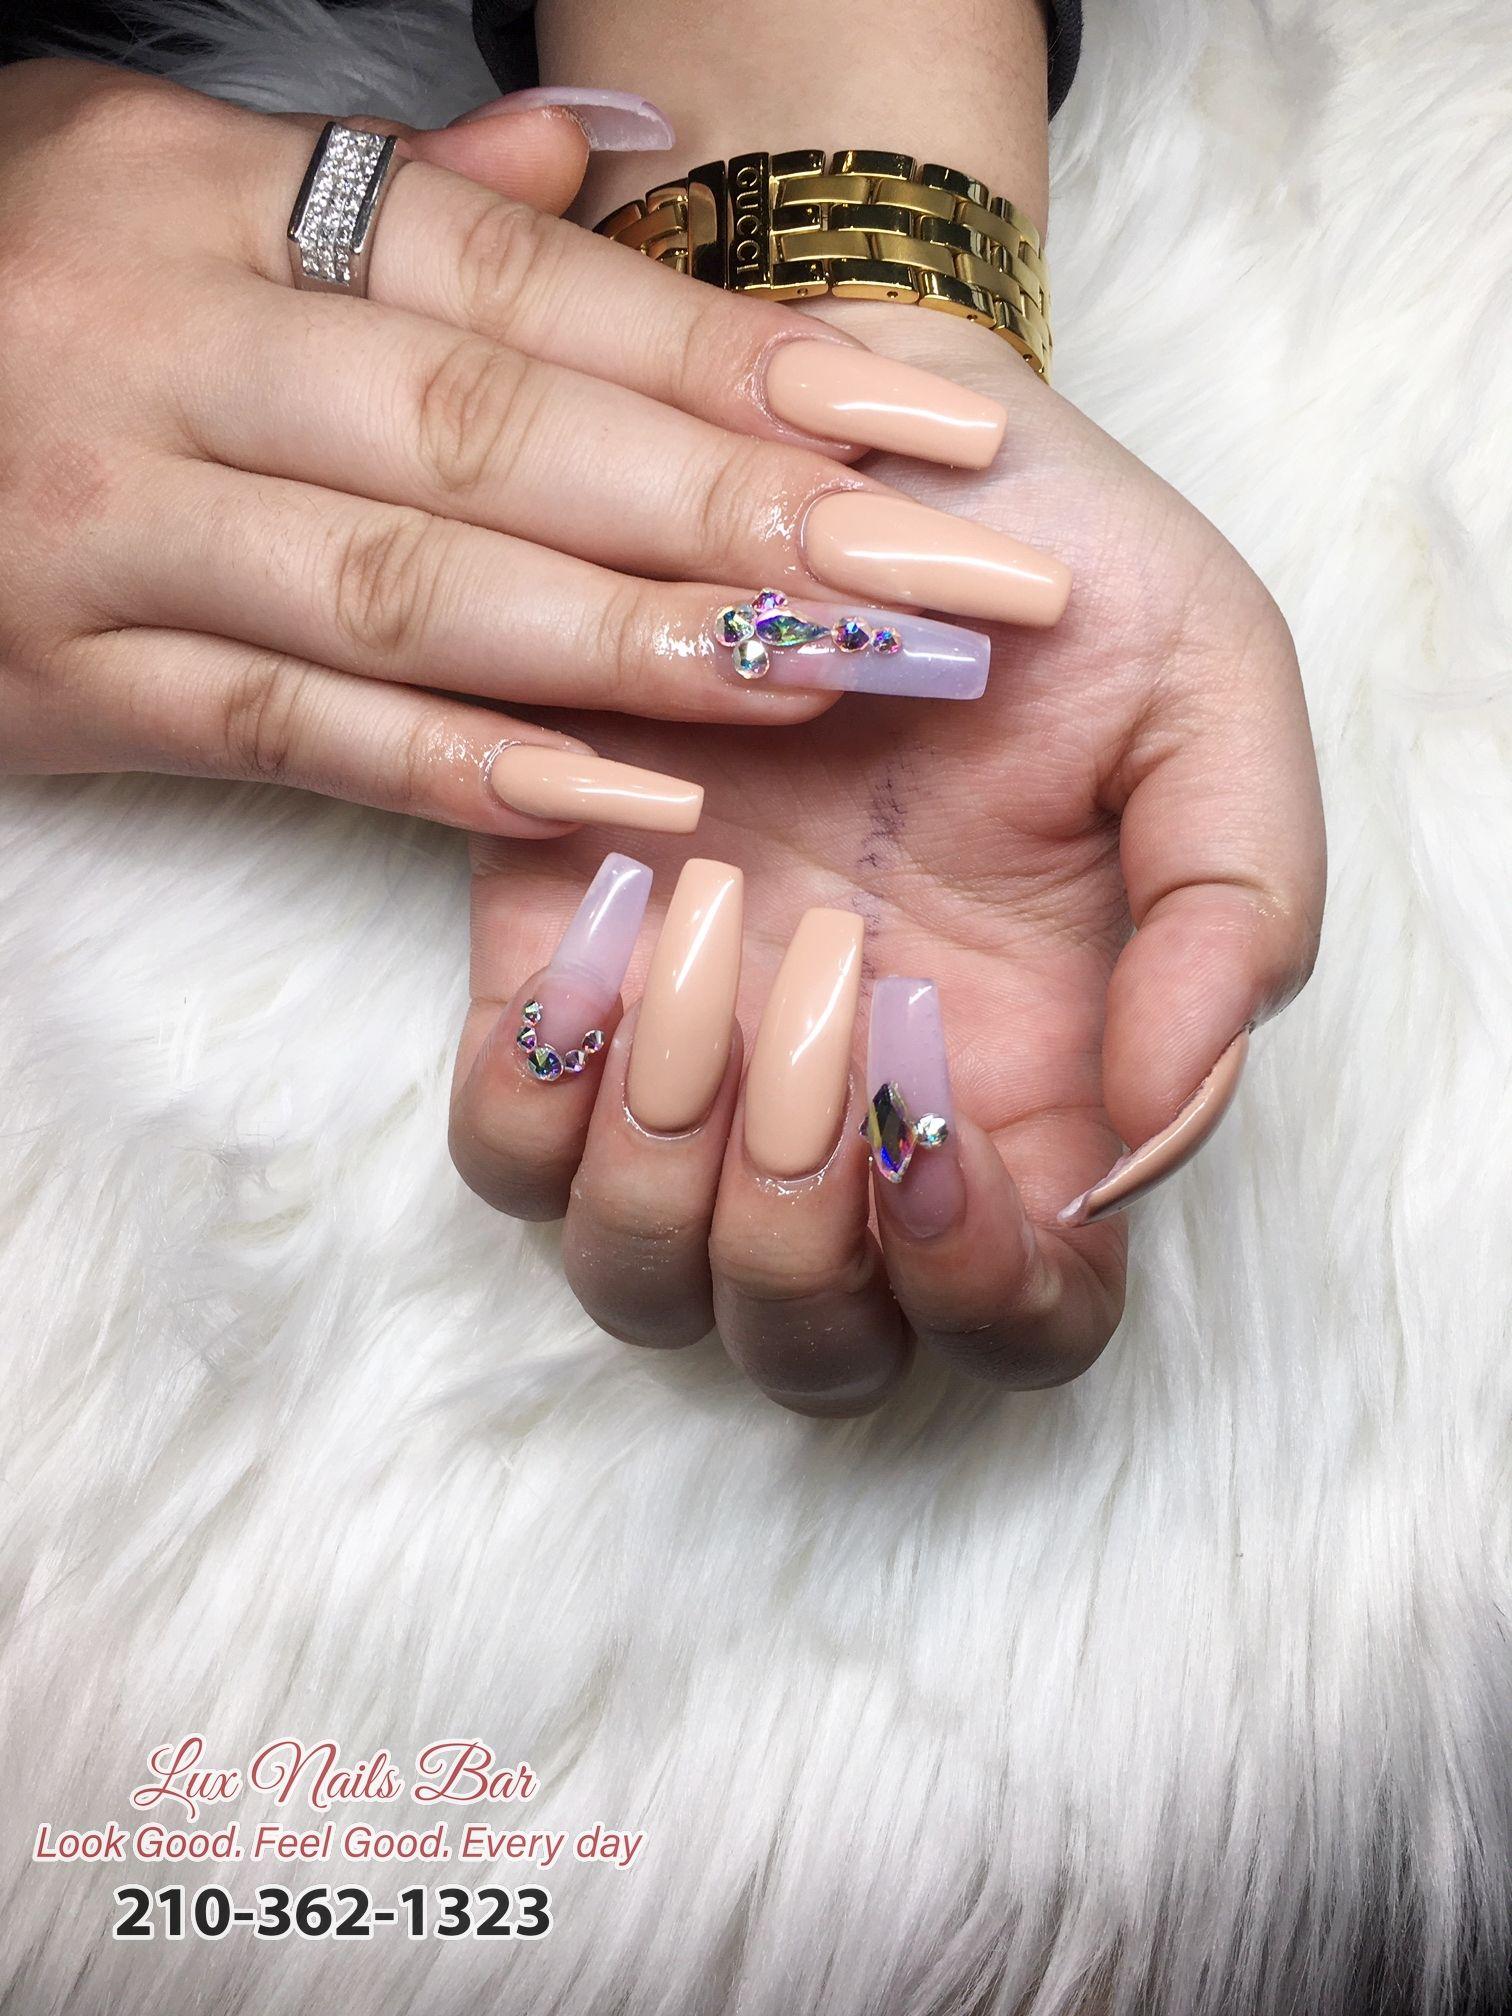 Pin On Manicure